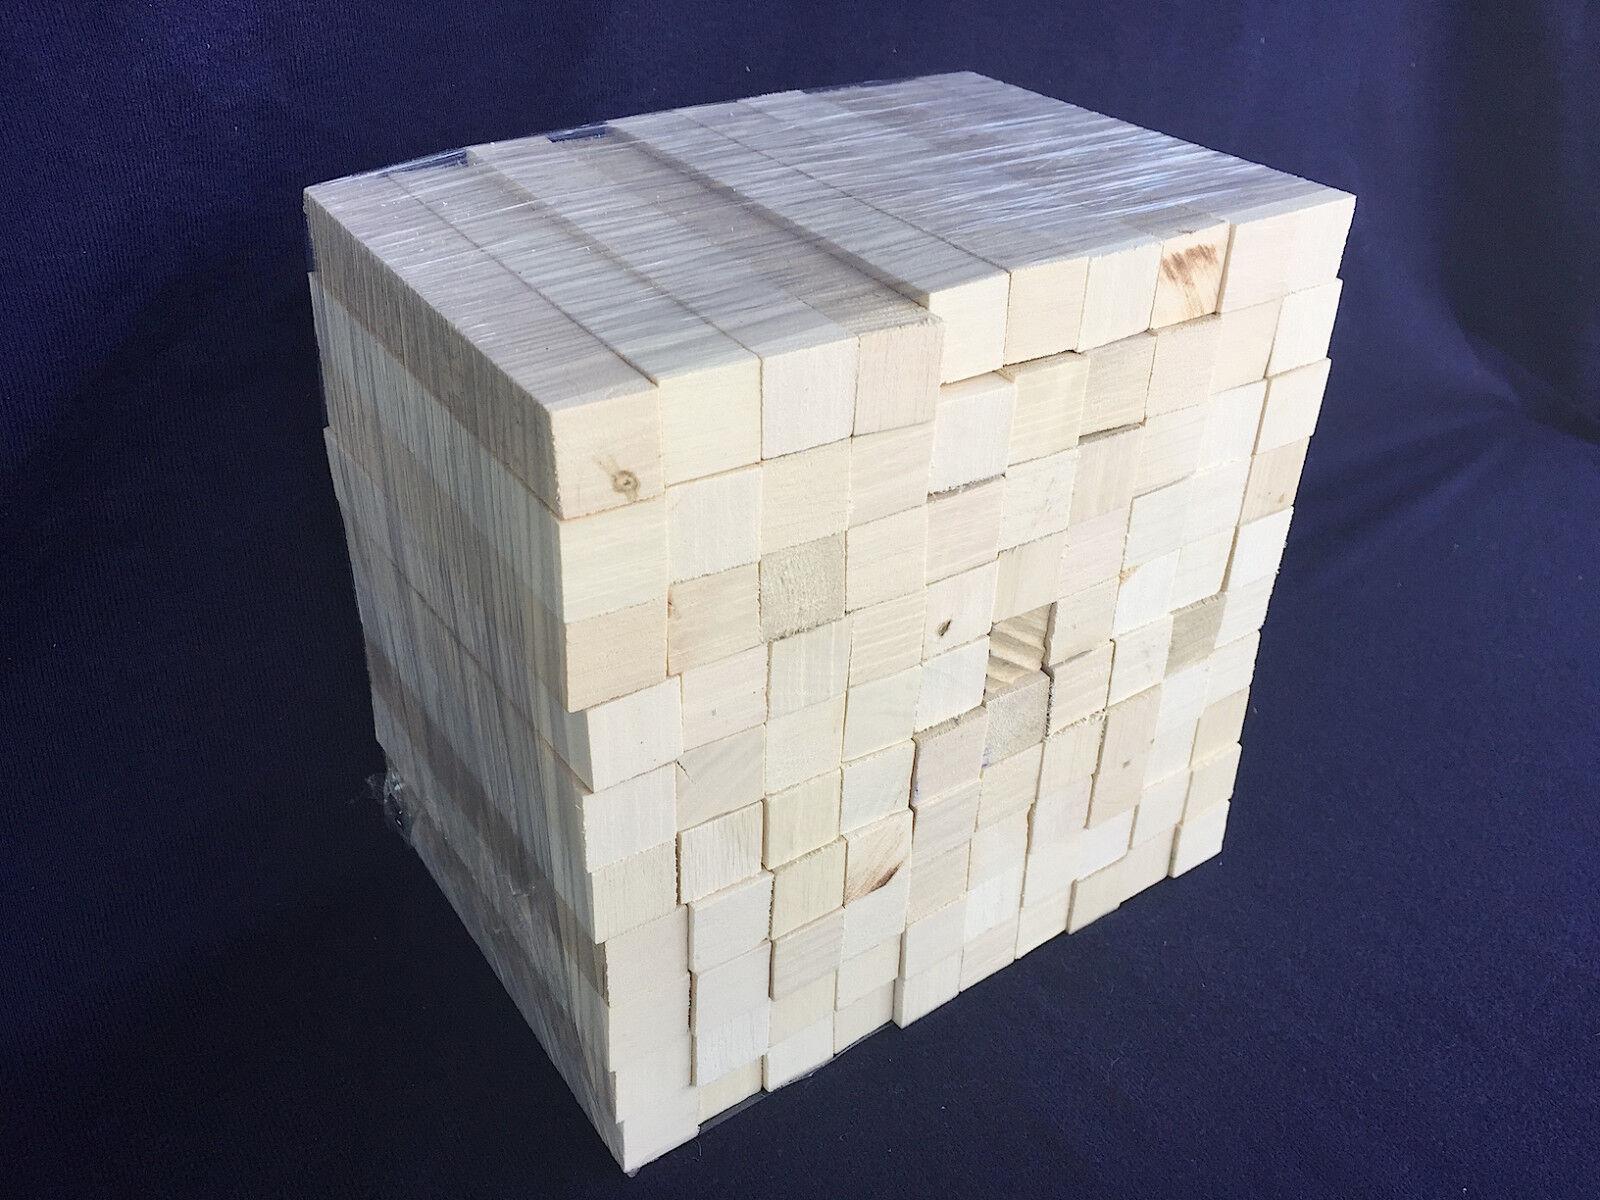 Holly American lumber wood turning squares pen blanks - * 100 PCS * - 5/8